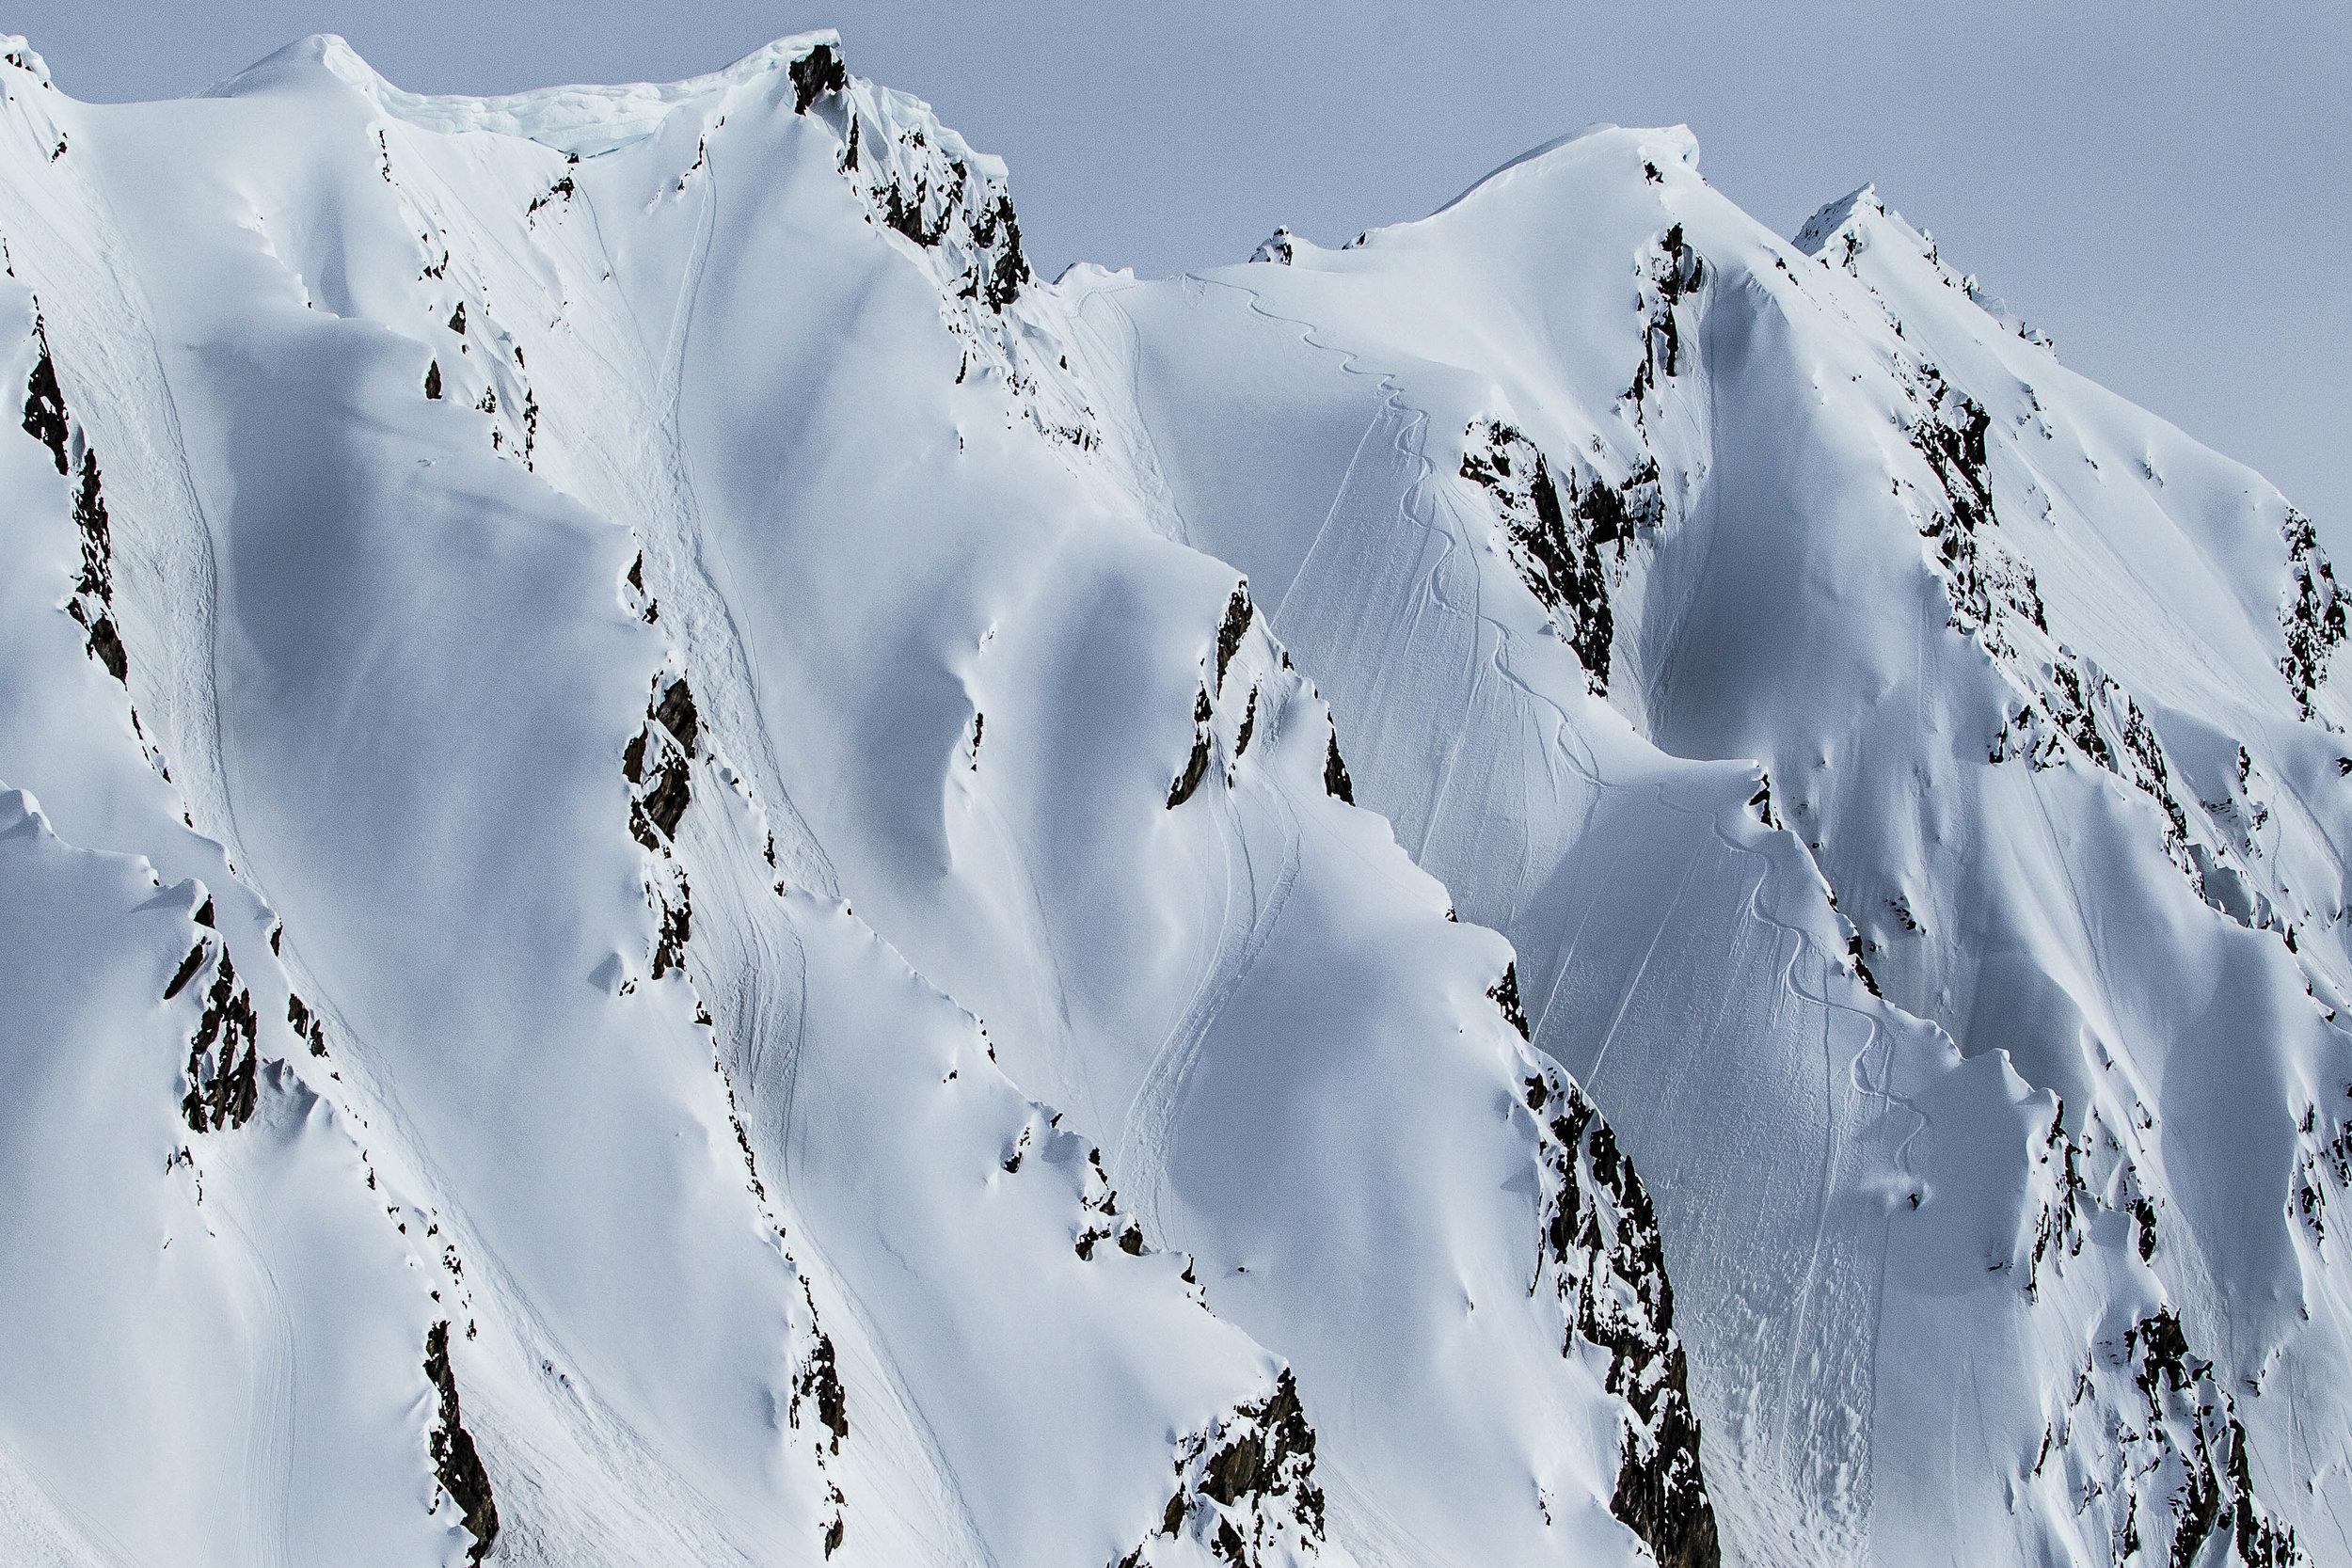 RitchieColasanti_Alaska_JeffBrockmeyer_236.jpg